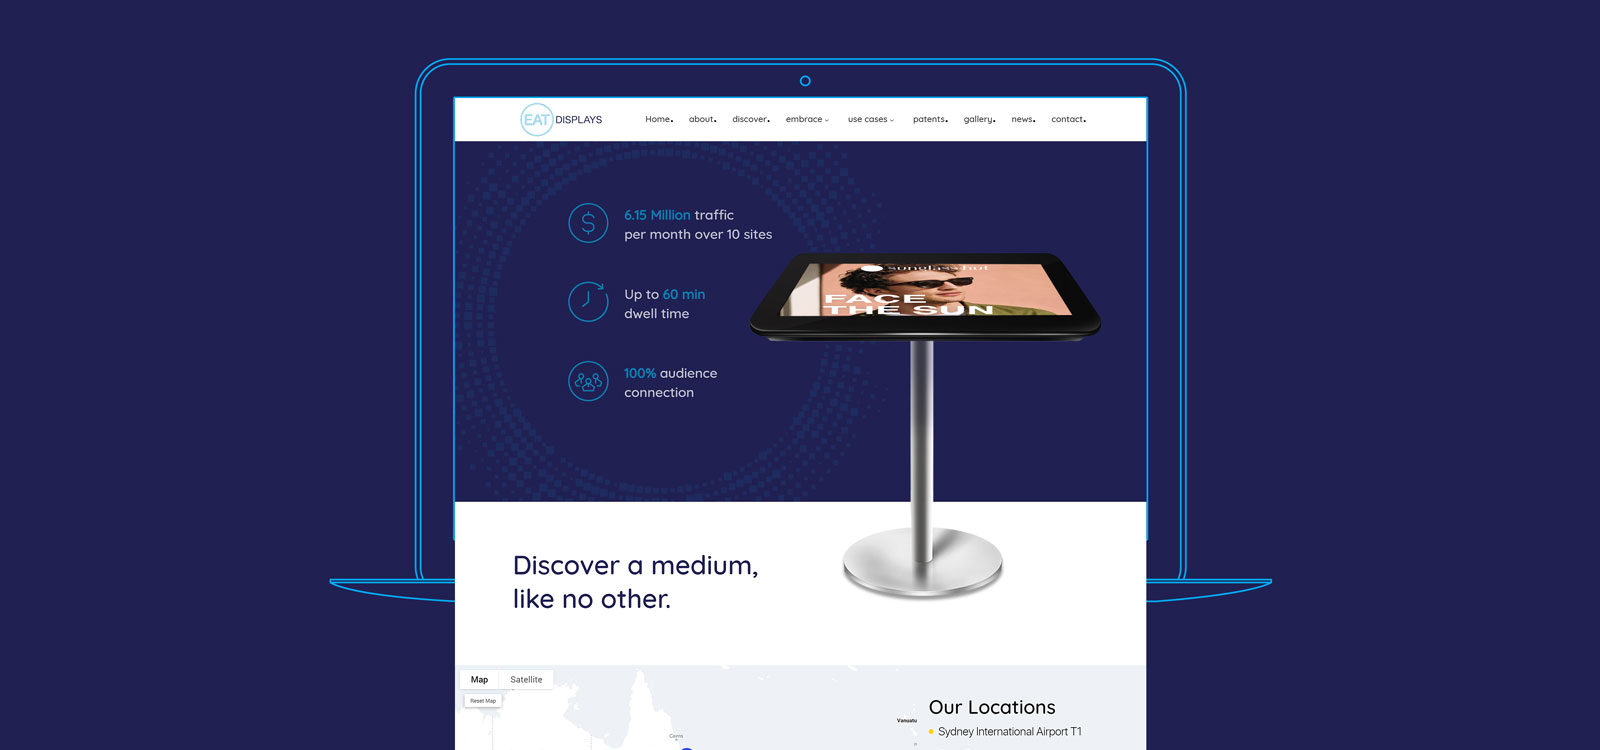 Web designing for EAT Displays